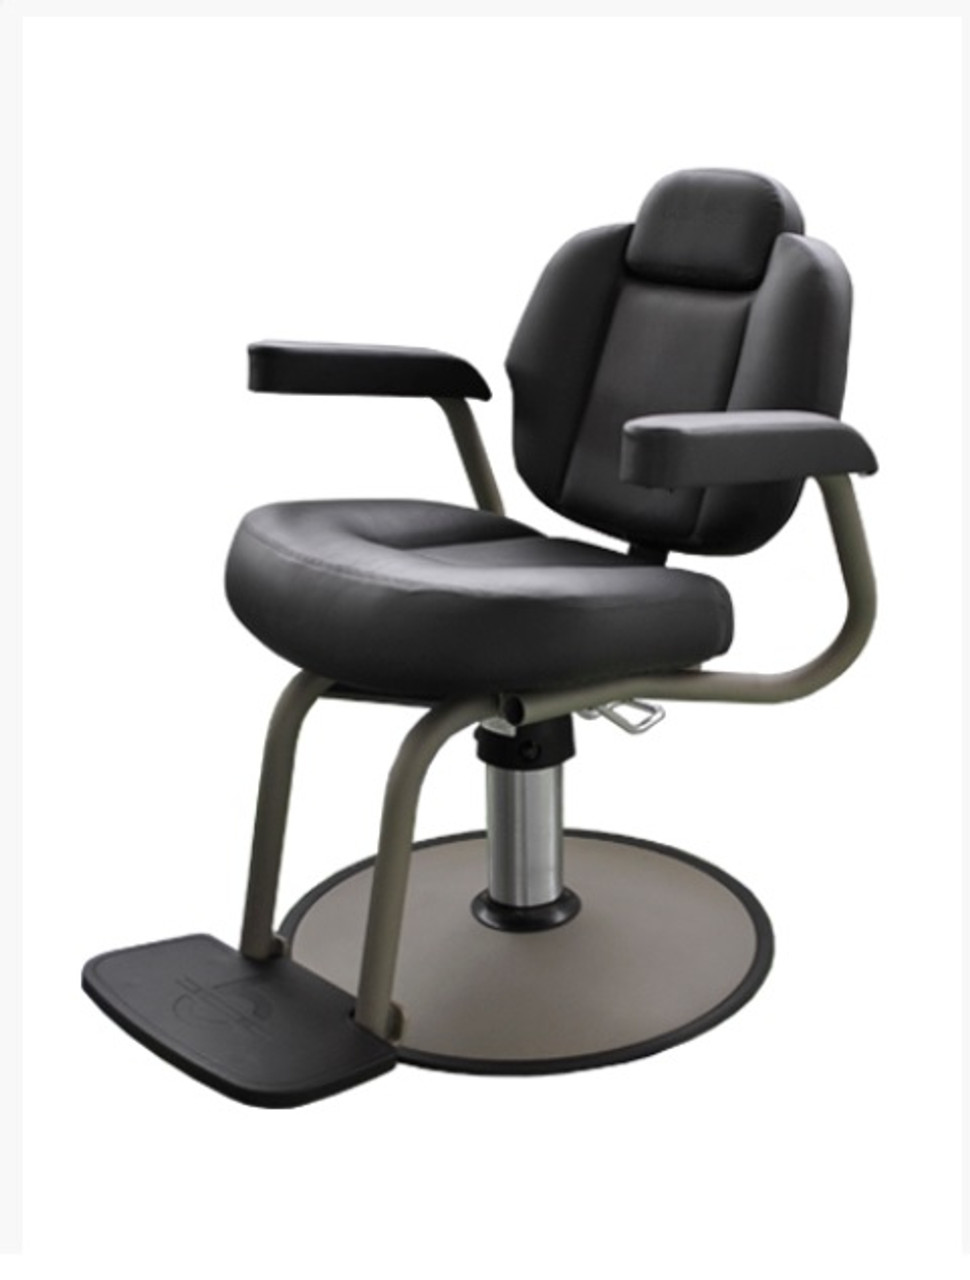 belvedere seville barber chair rh hairstylersfriend com